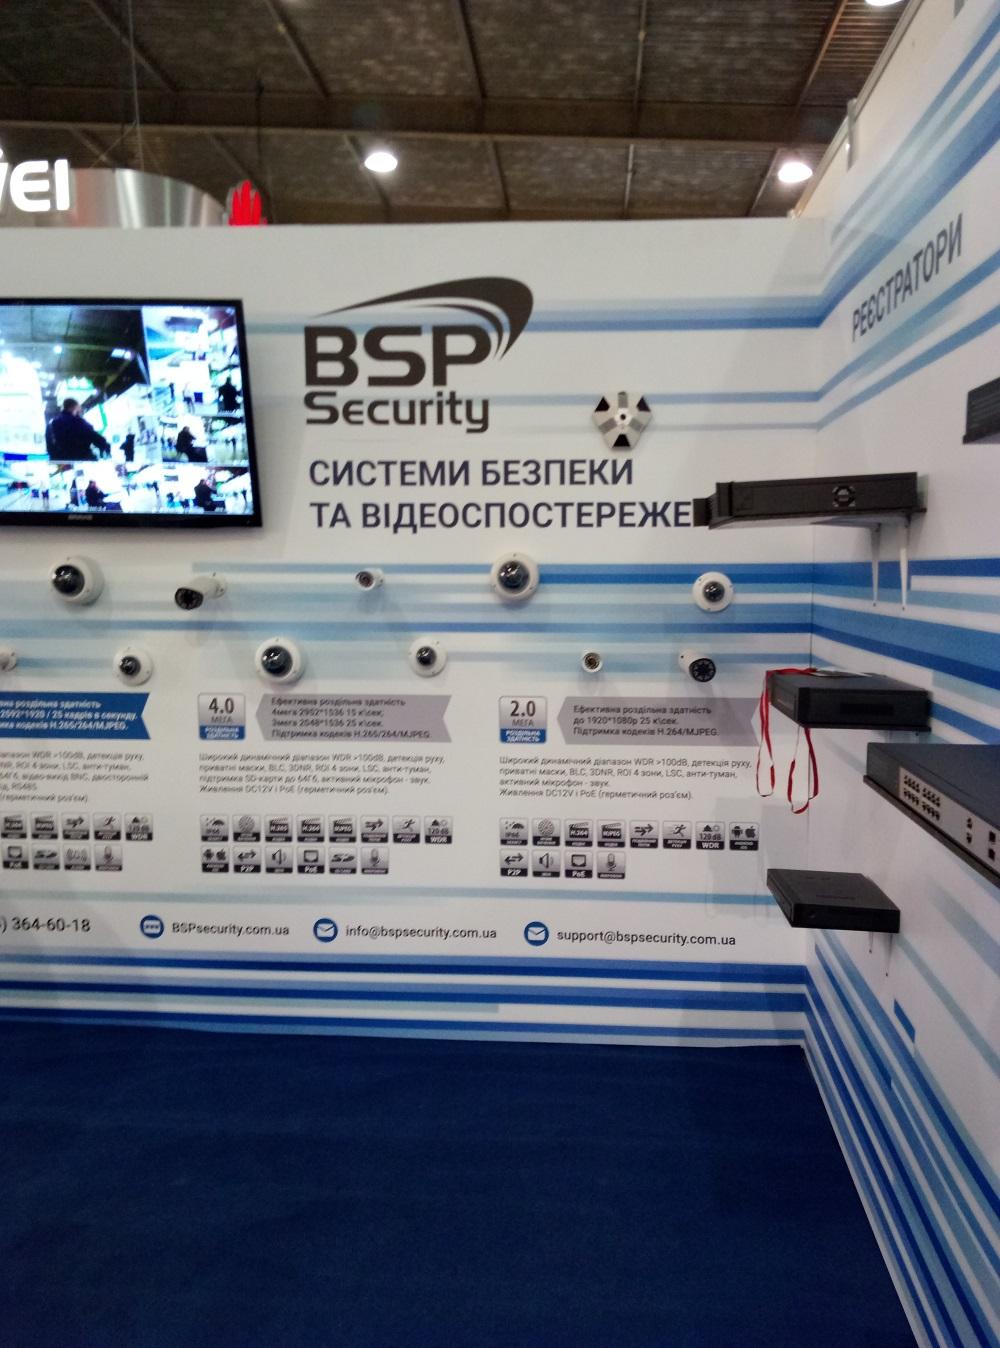 BSP Security - Выставка Безпека-2016 в Киеве: http://bspsecurity.ru/text-2/vystavka-bezpeka2016-v-kieve/